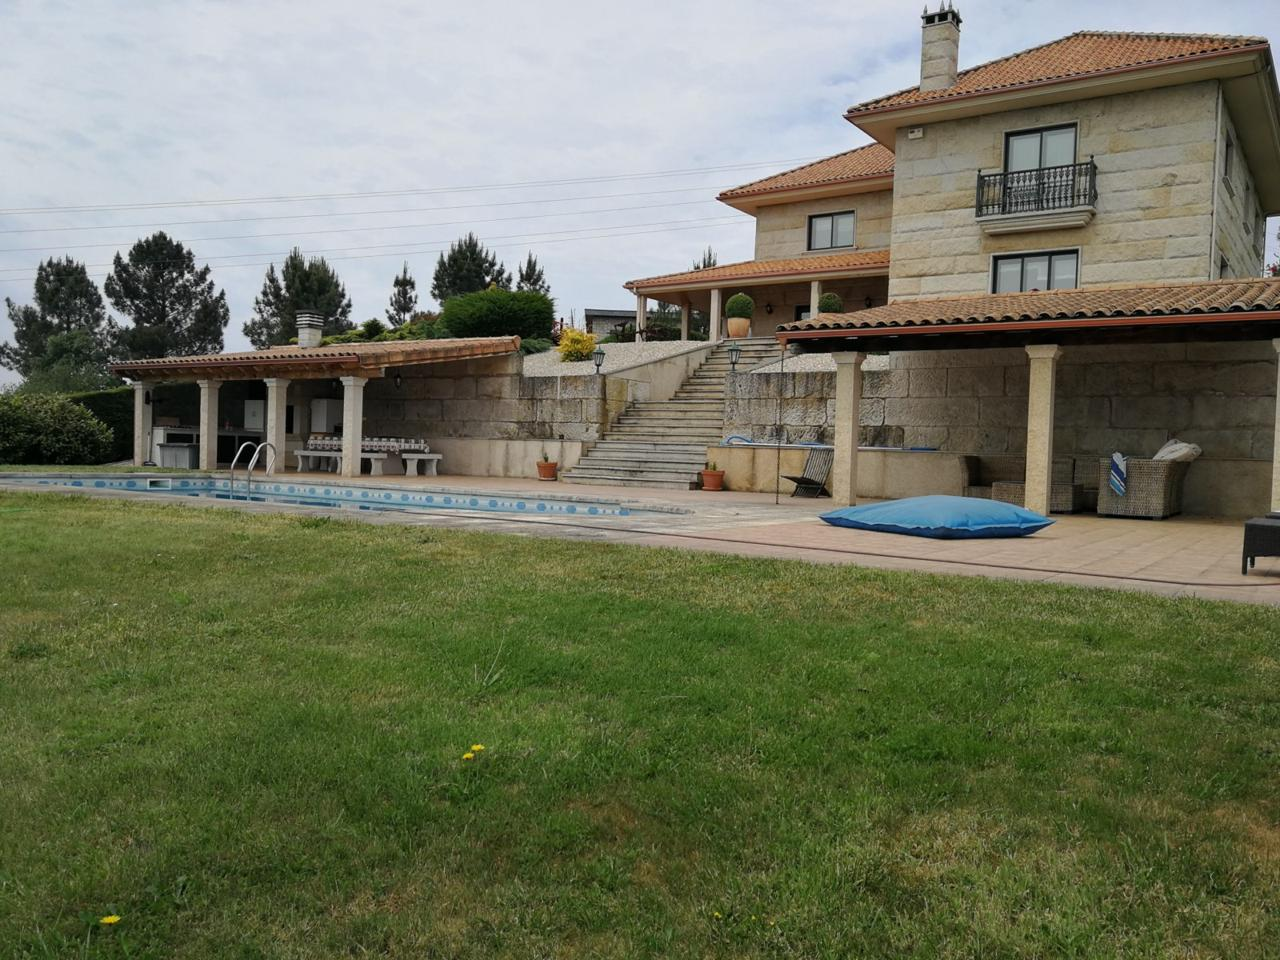 Casa / Chalet en venta en Orense de 498 m2